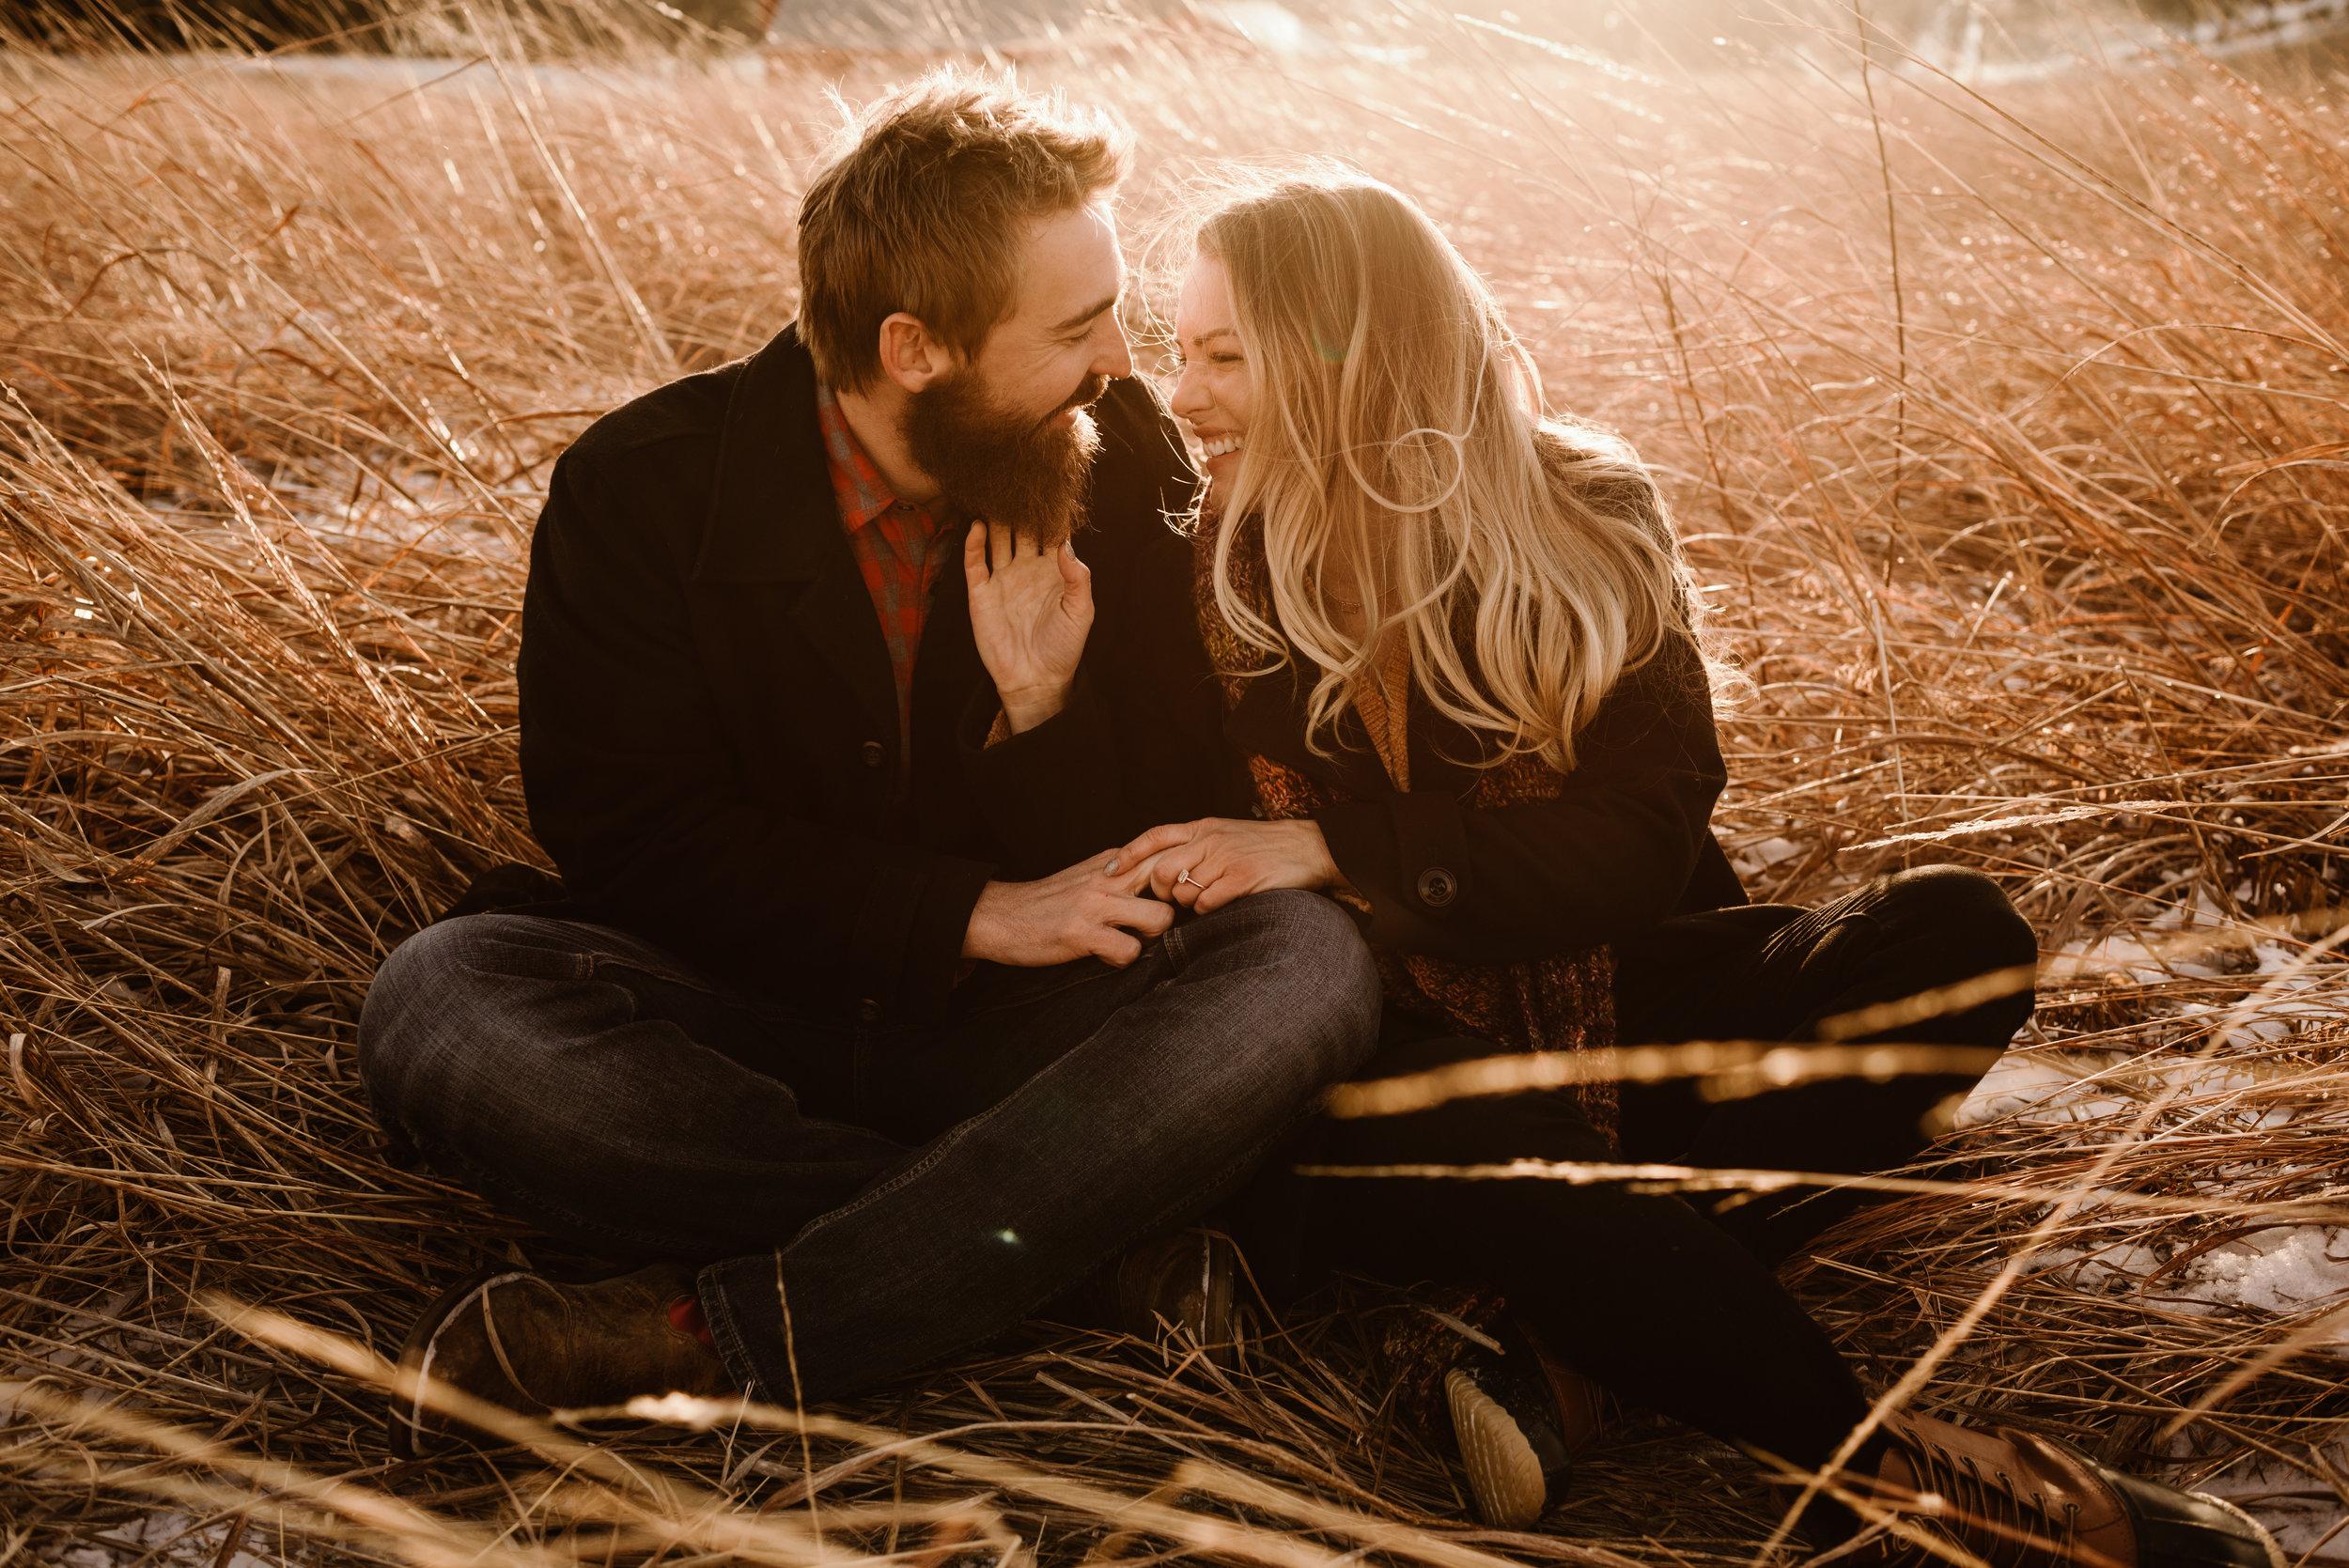 Nebraska+Engagement+Photographer+Kaylie+Sirek+Photography+021.jpg